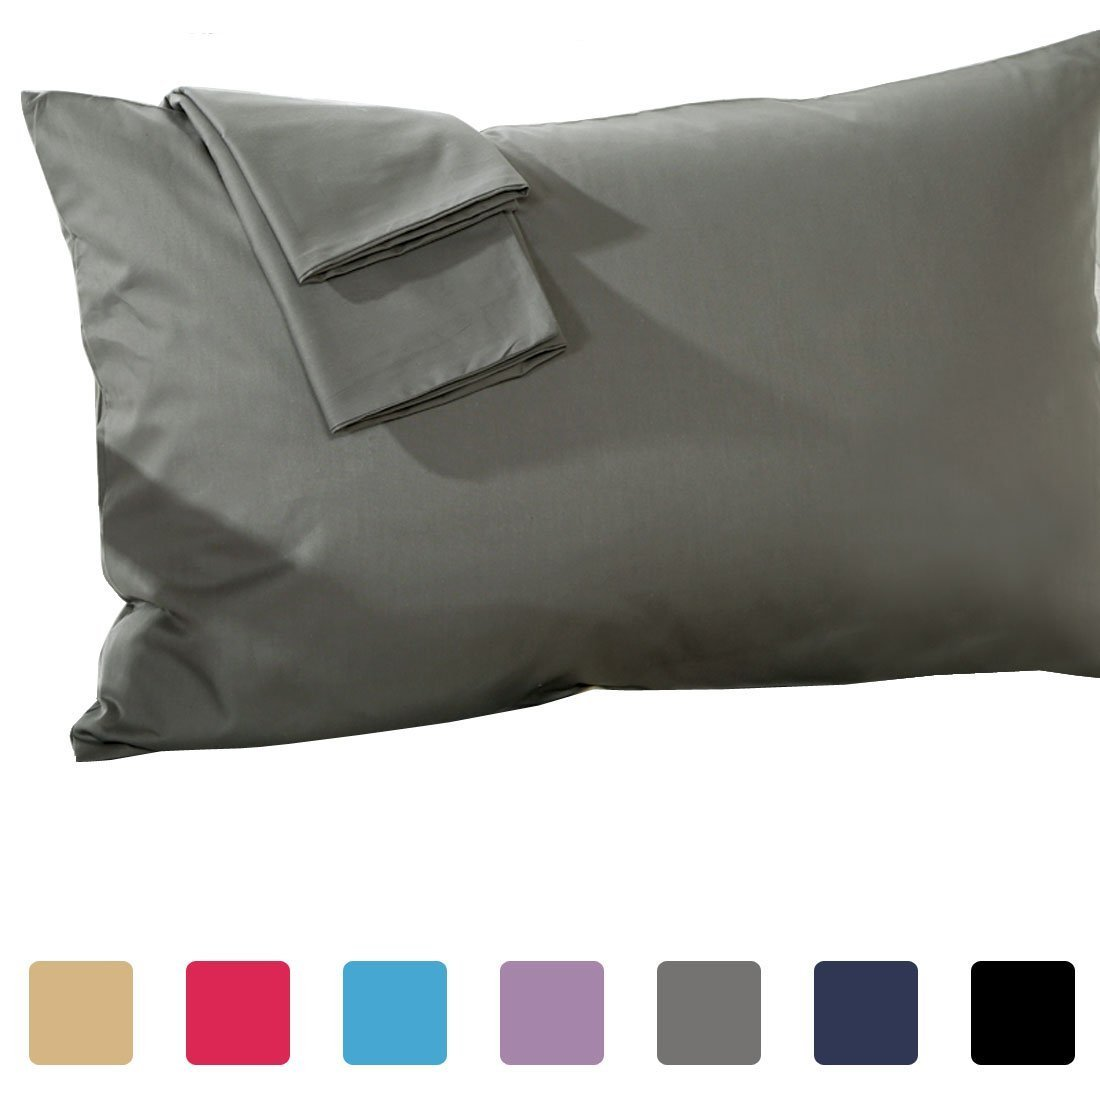 Set of 2 - Toddler Travel Pillowcase 500 Thread Count 12''x16'' Size, Dark Gray, with 100% Egyptian Cotton